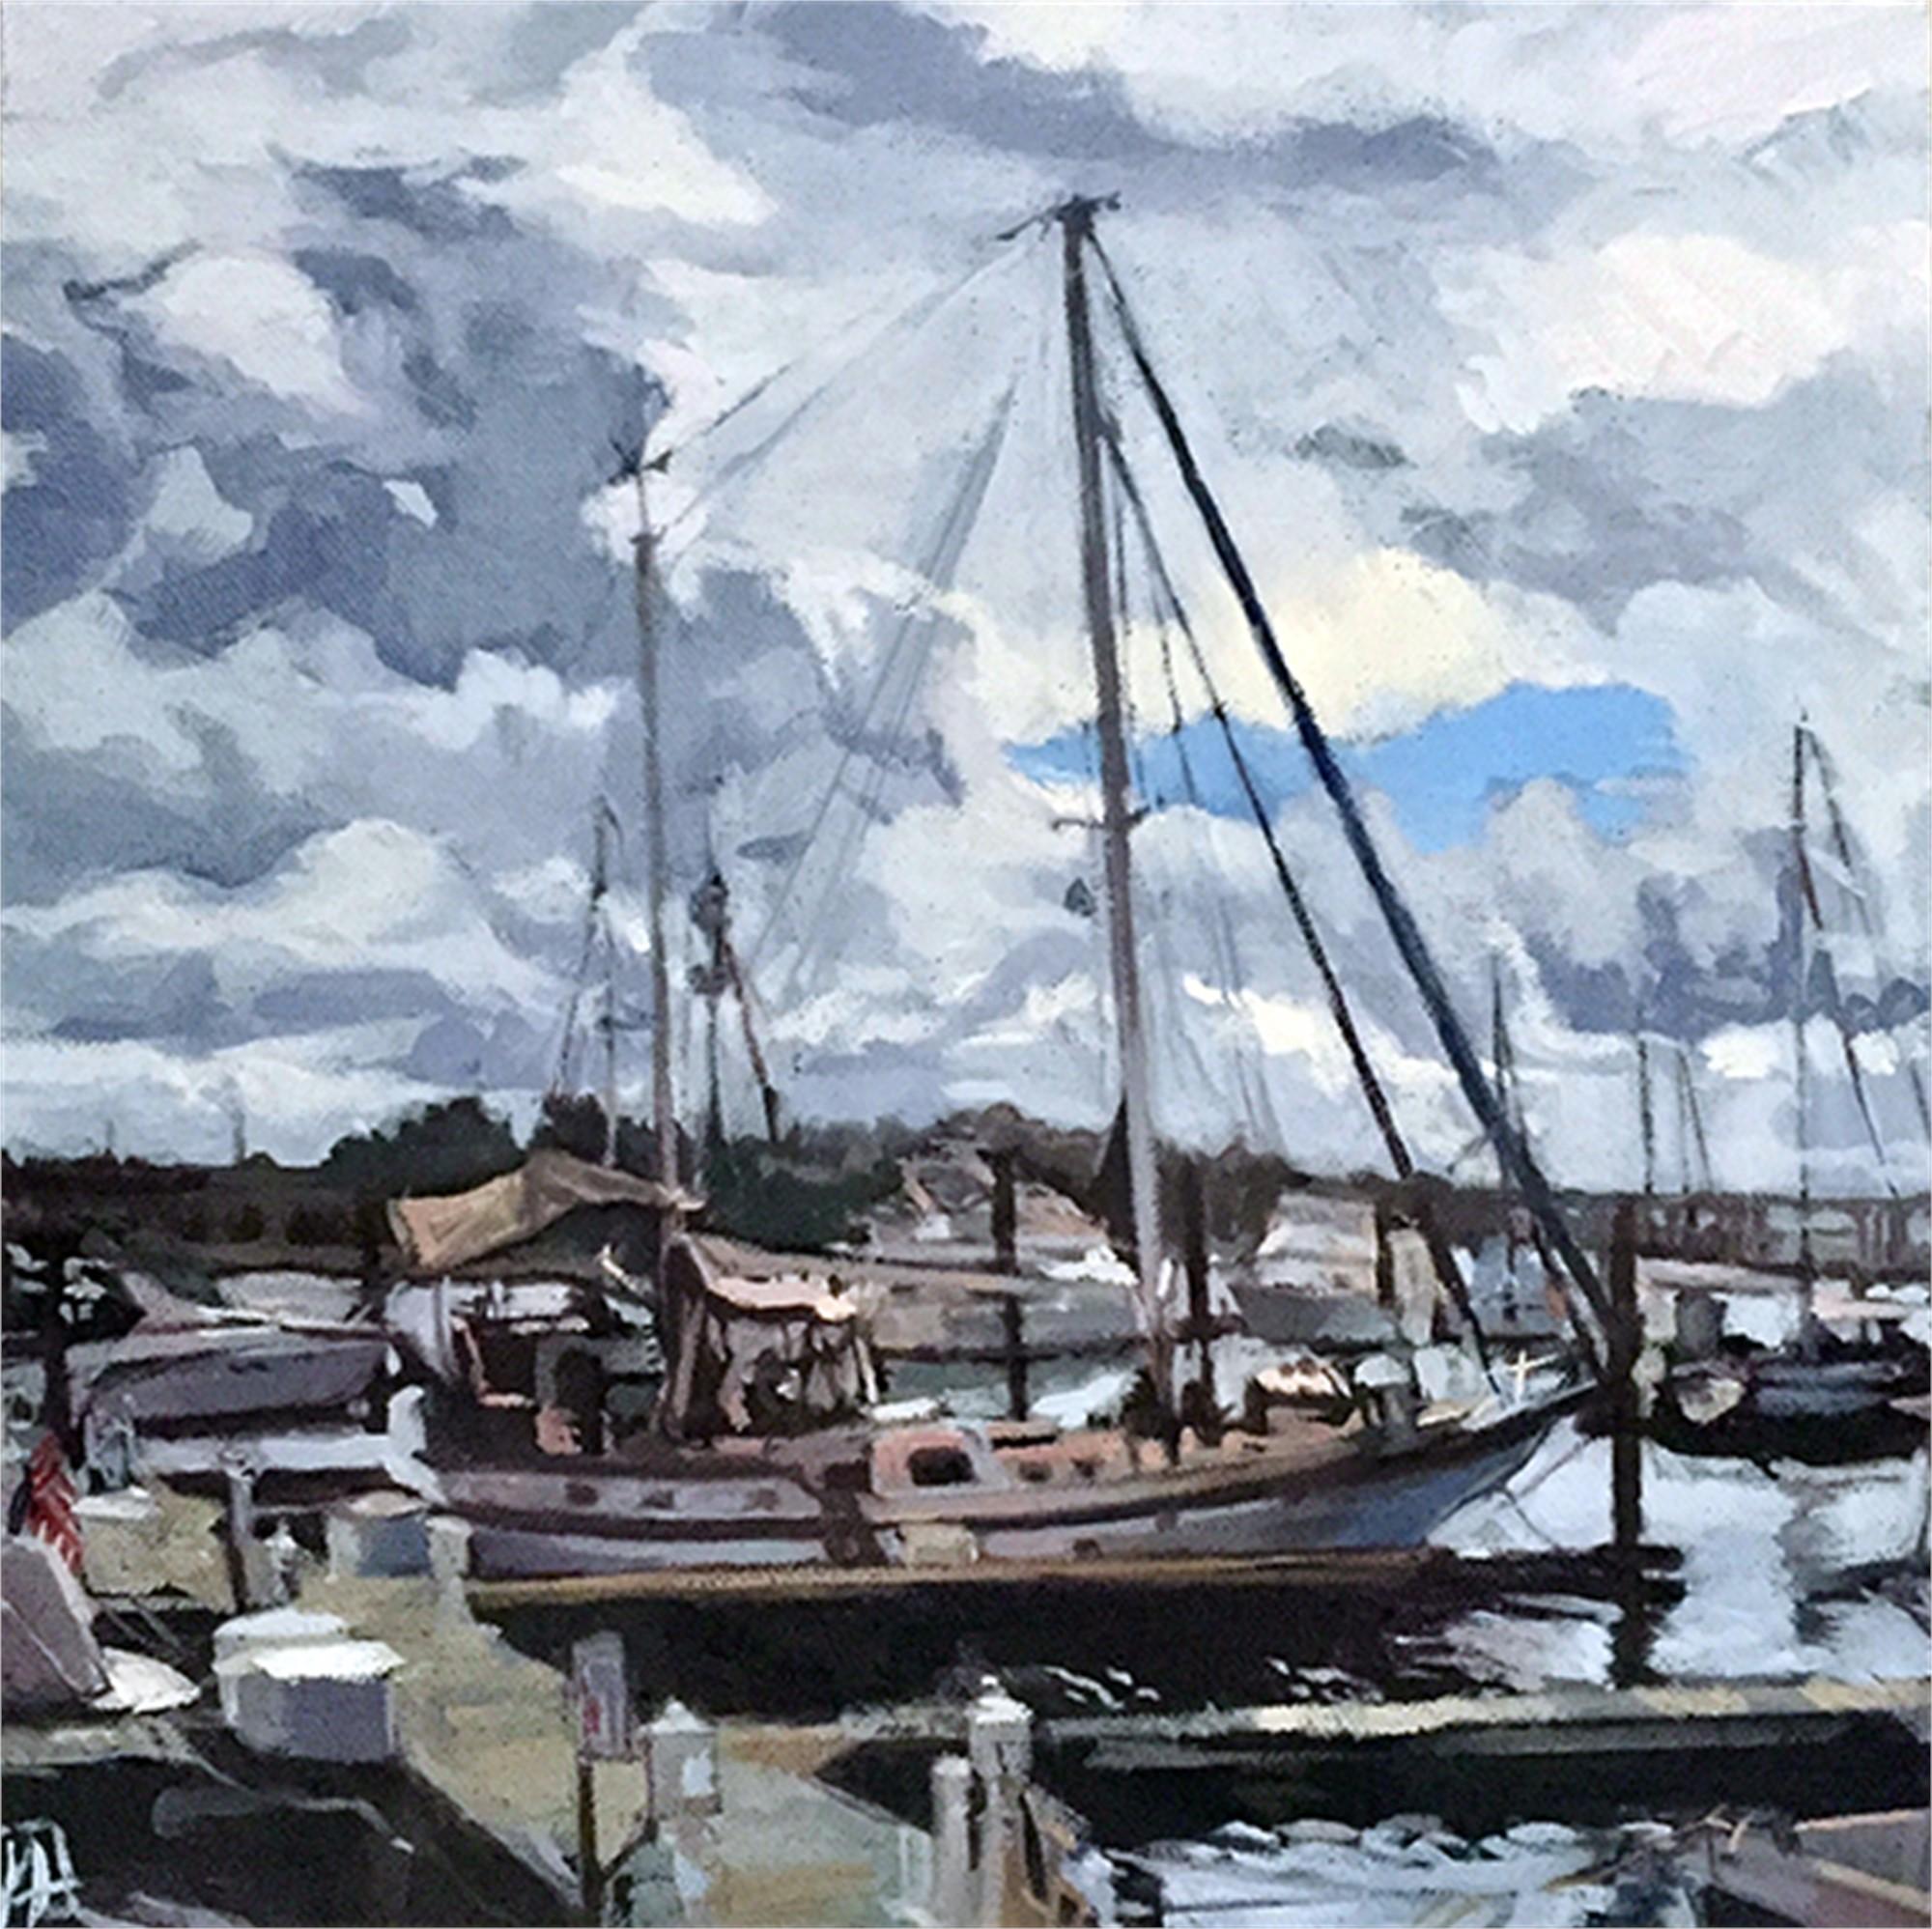 Sailboats in Marina by Julie Larick